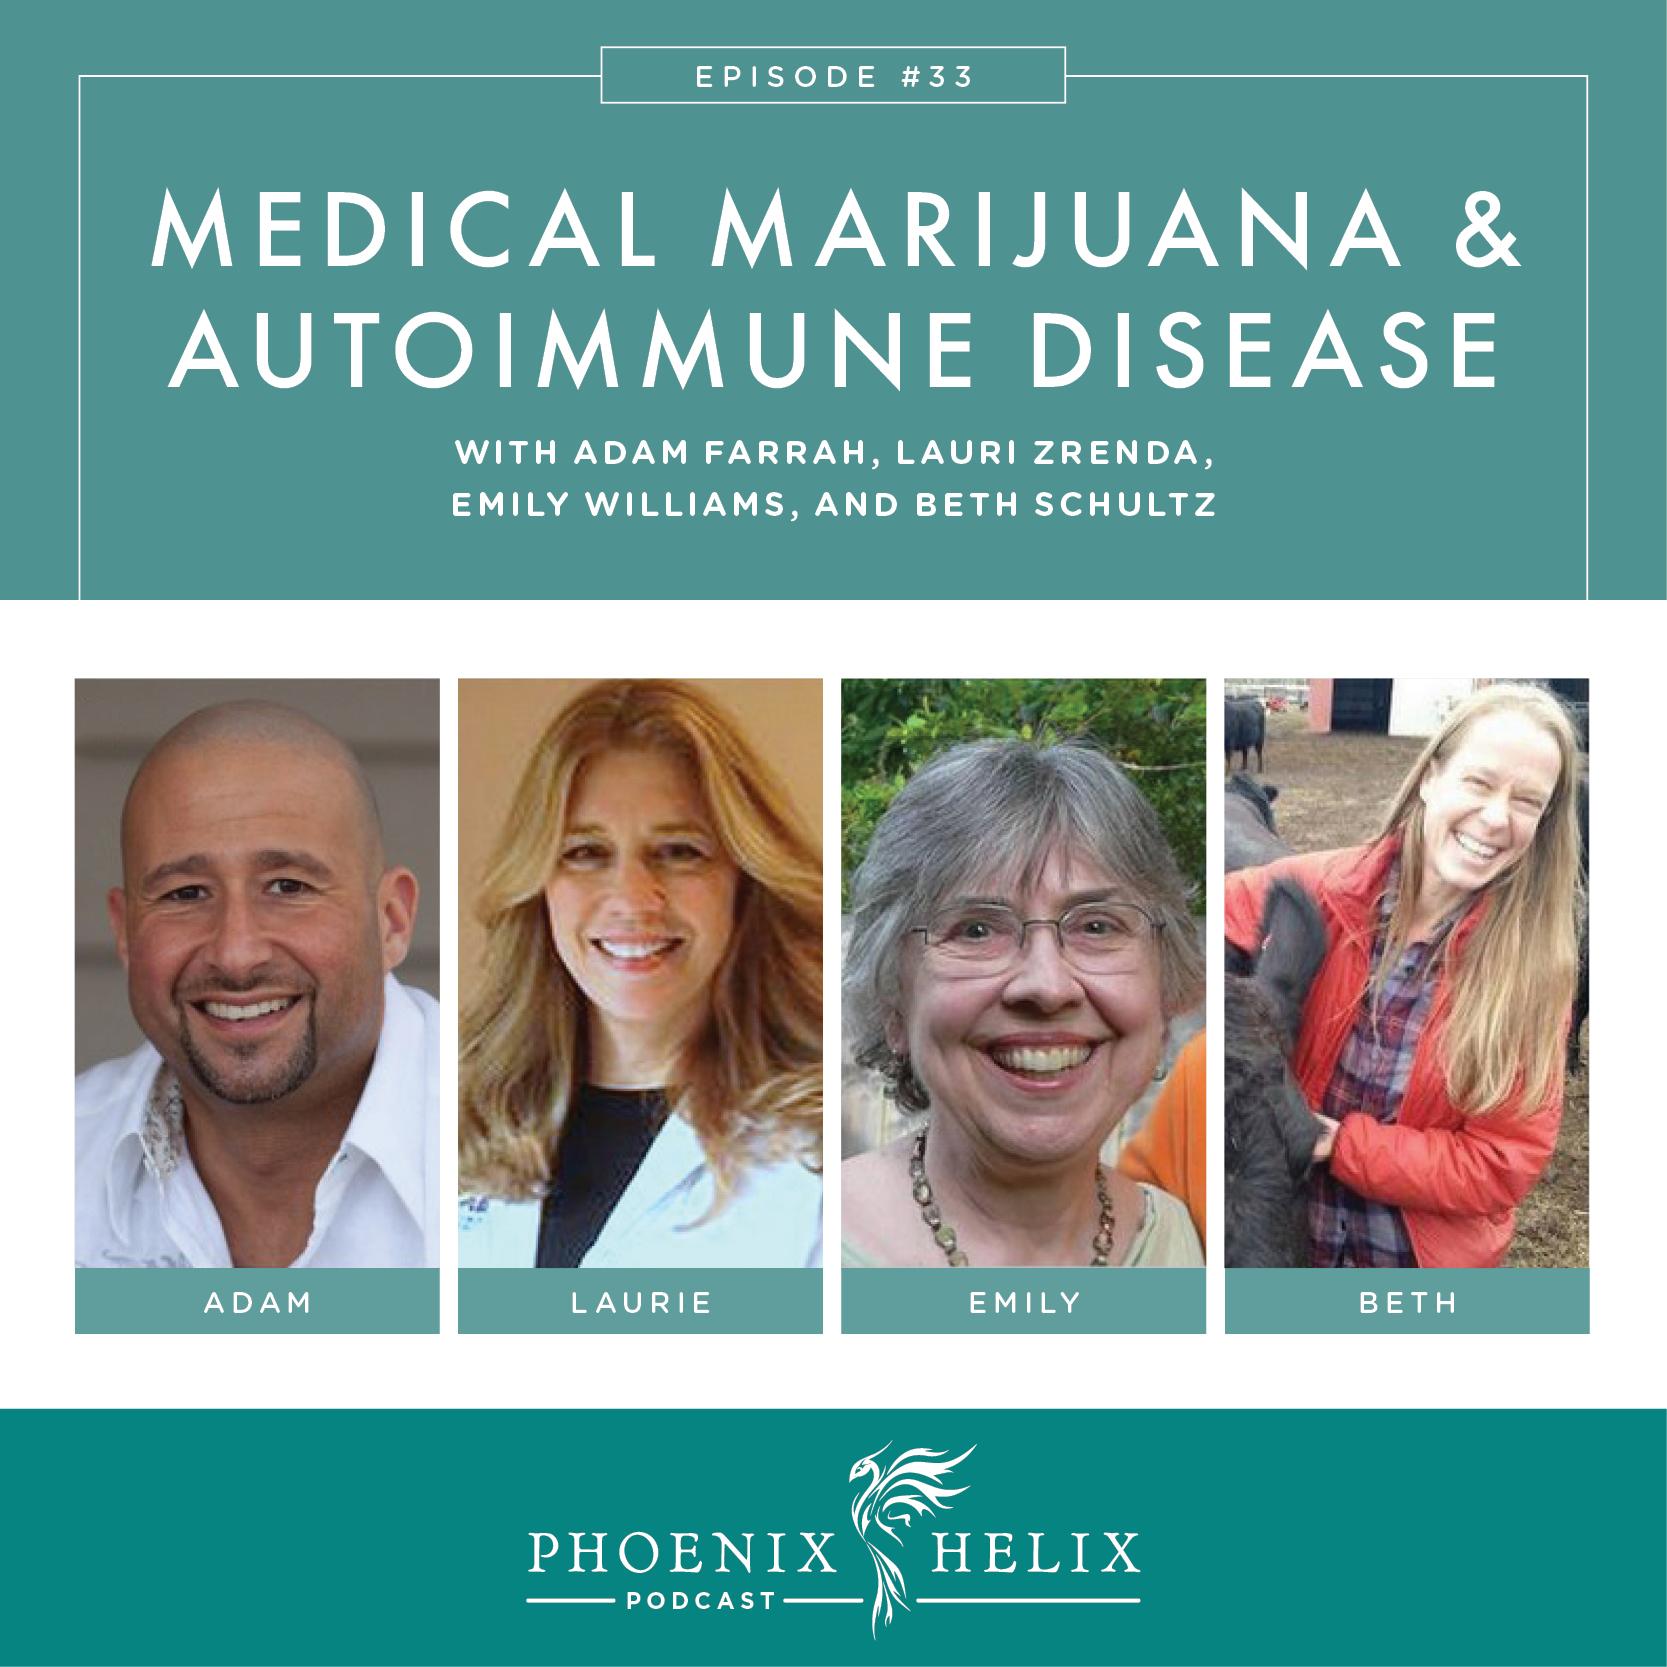 Medical Marijuana and Autoimmune Disease | Phoenix Helix Podcast